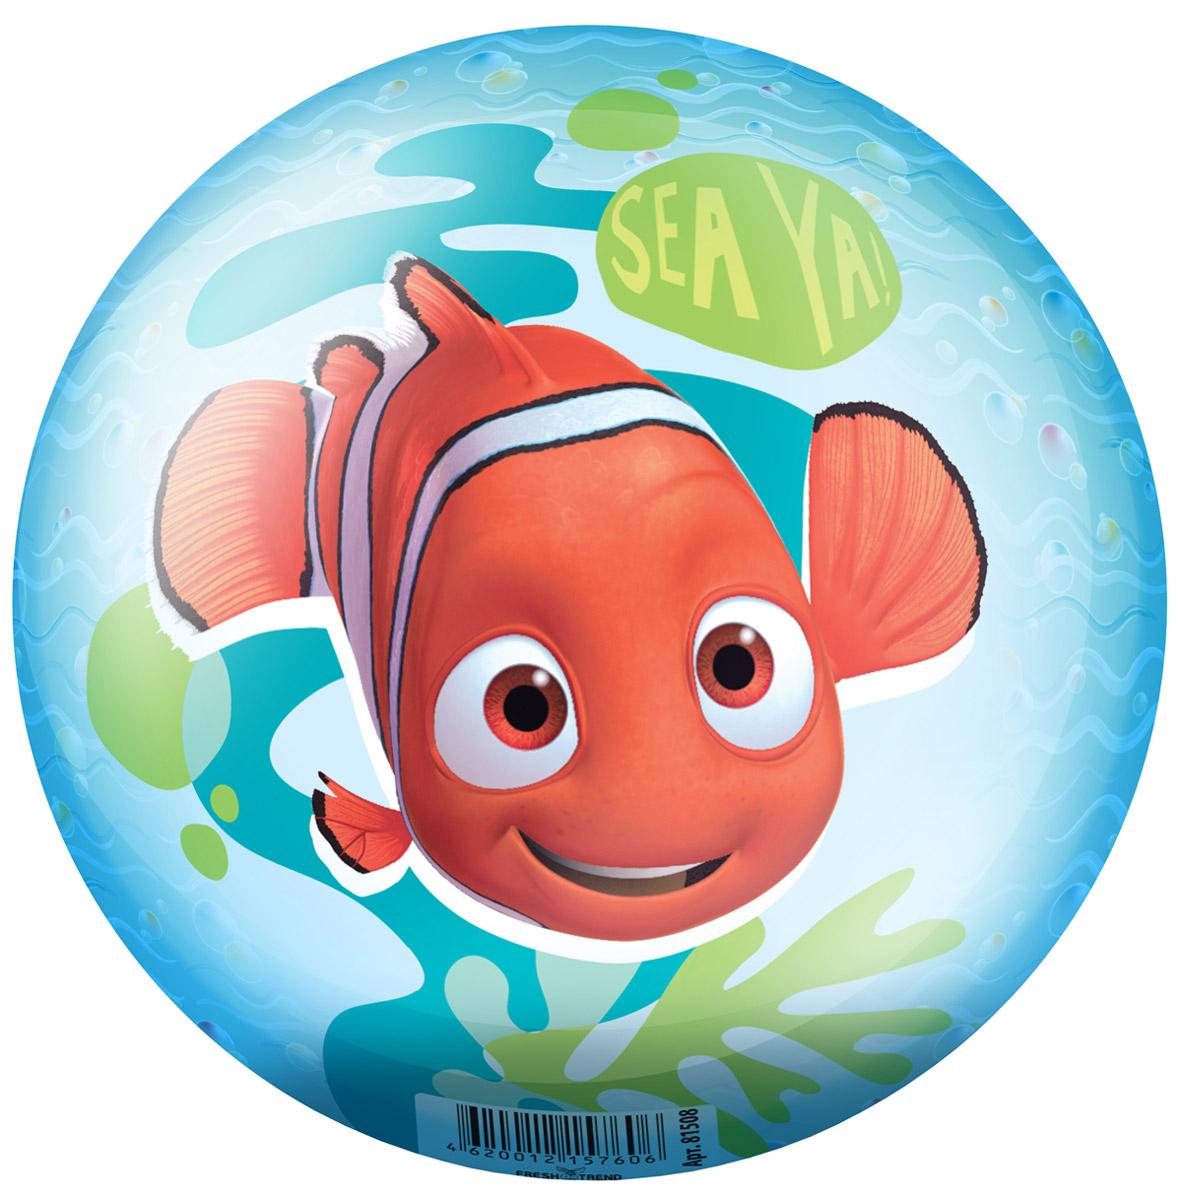 Fresh Trend Мяч В поисках Немо 15 см мячики и прыгуны fresh trend мяч в поисках немо 23 см